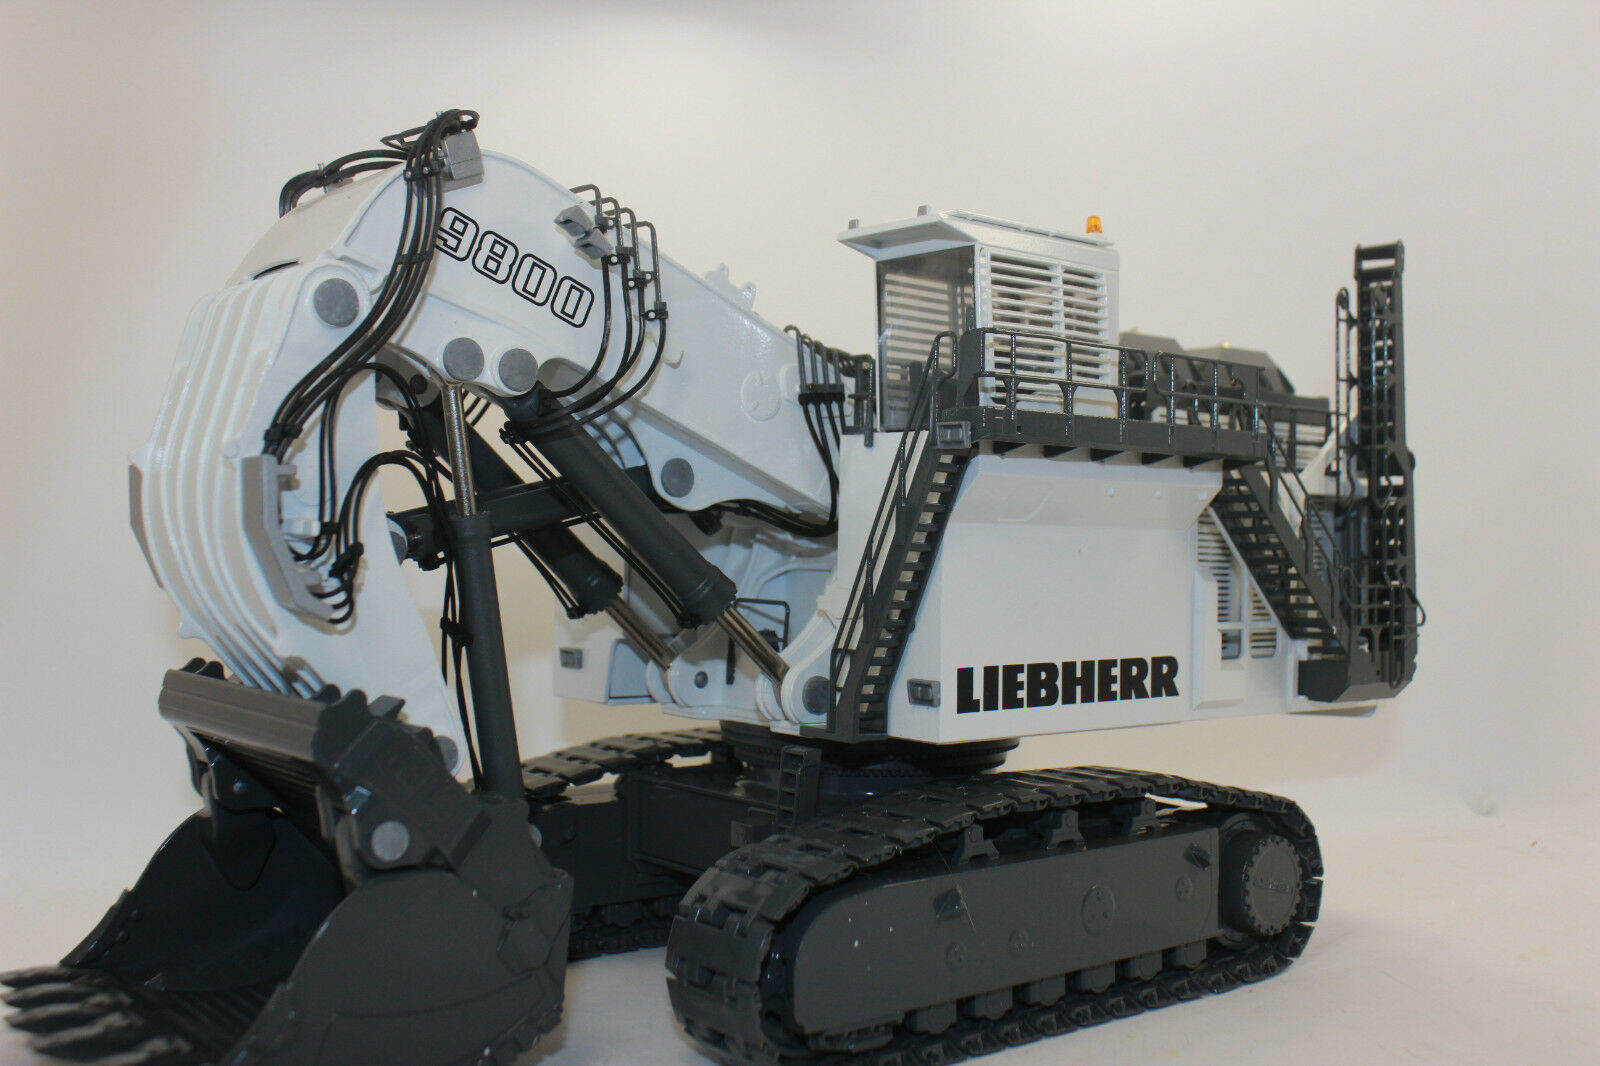 Conrad 2942 Liebherr R9800 Mining Excavator Front Shovel 1 50 New Boxed